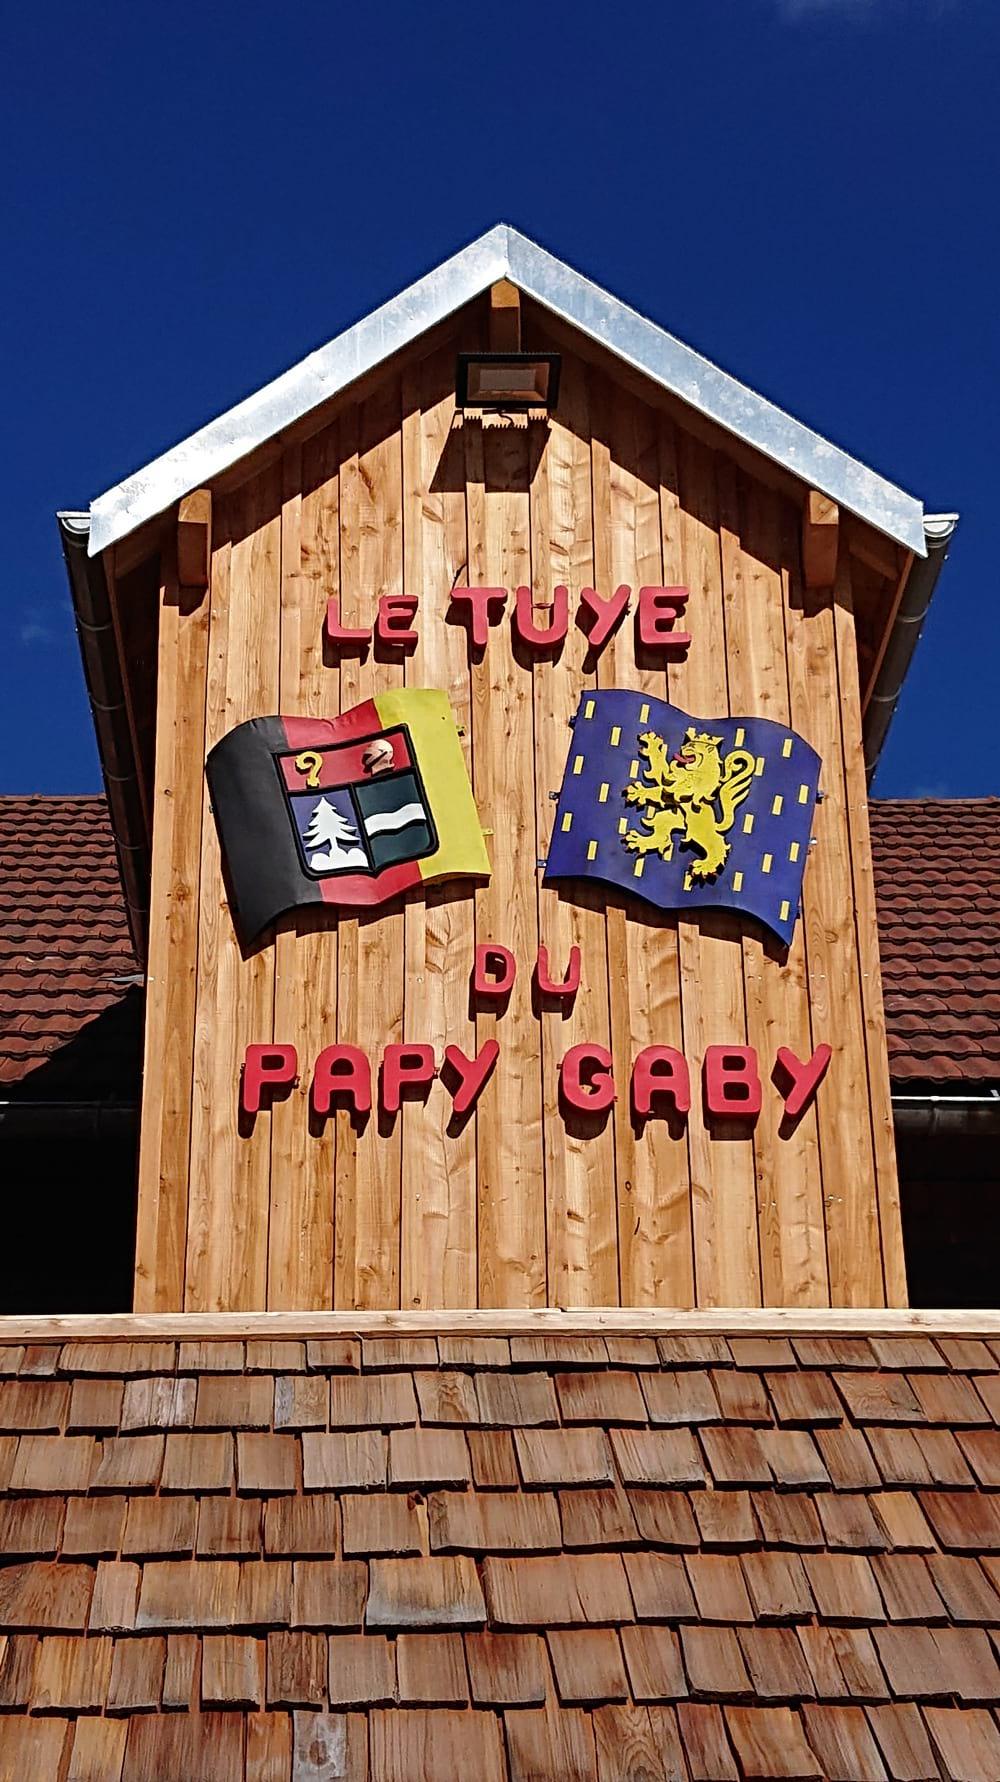 entreprise_et_decouverte_tuye_papy_gaby-9-tuye-du-papy-gaby